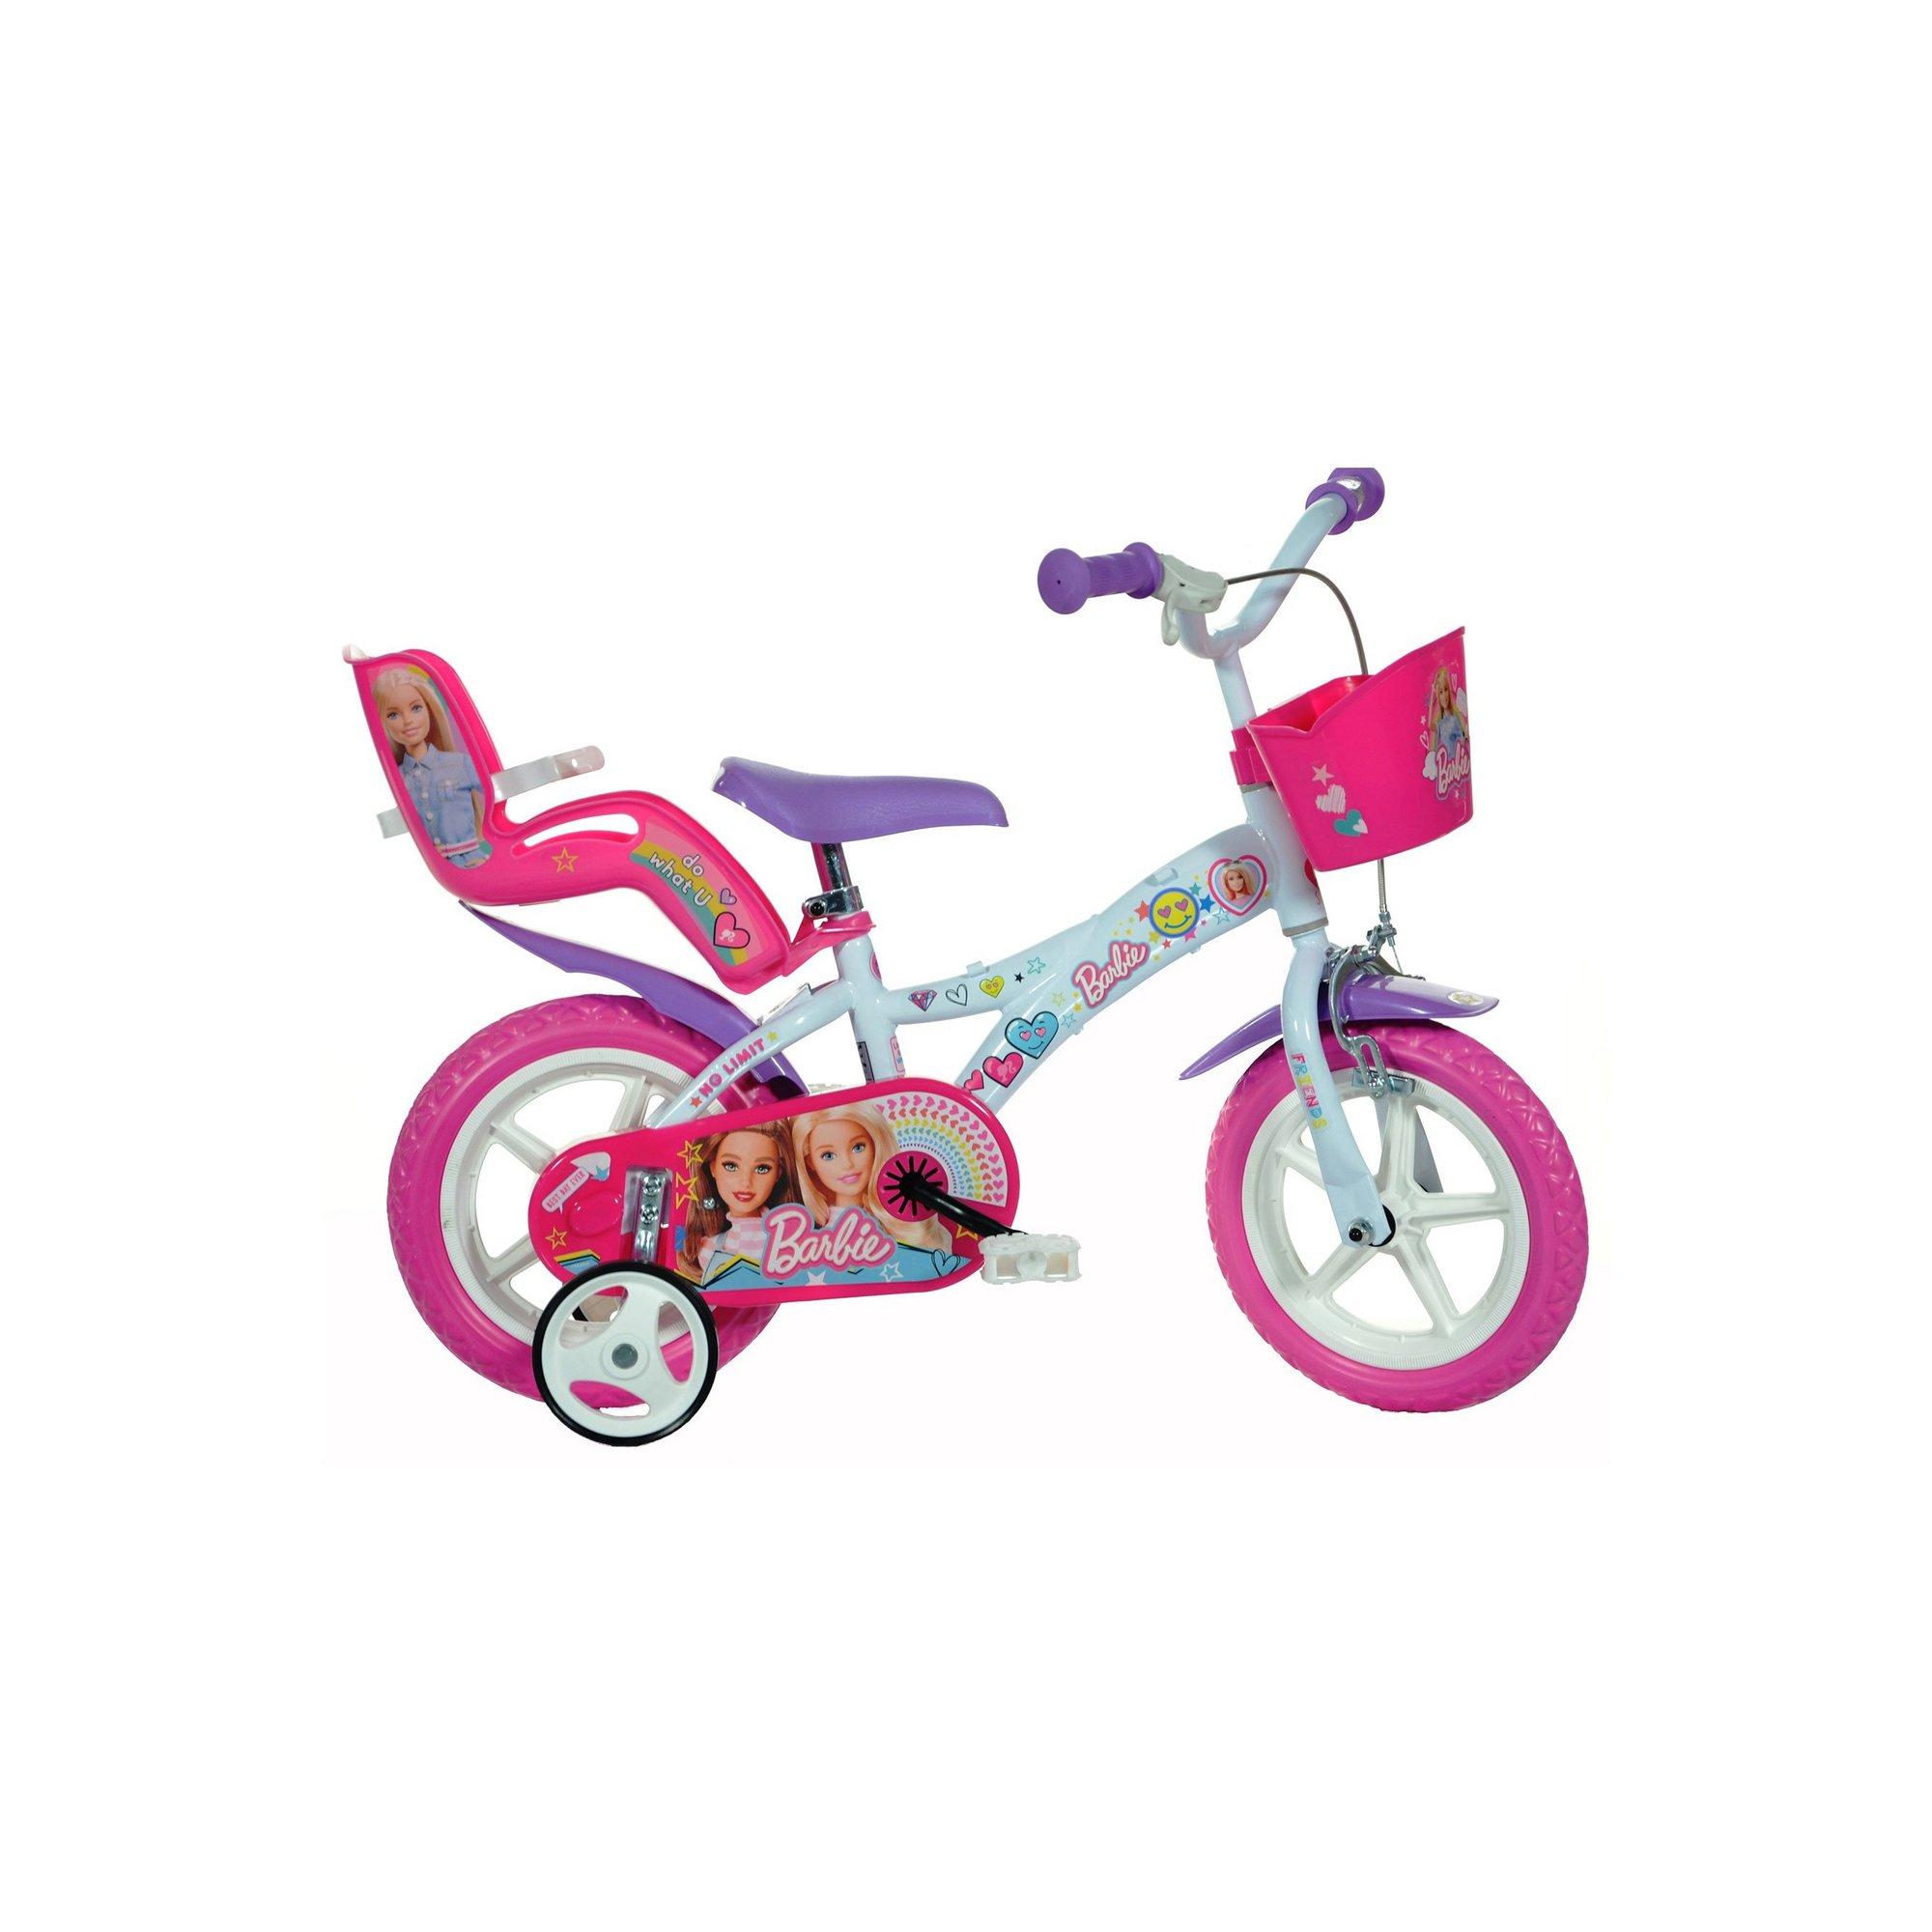 Image of Barbie Bicycle